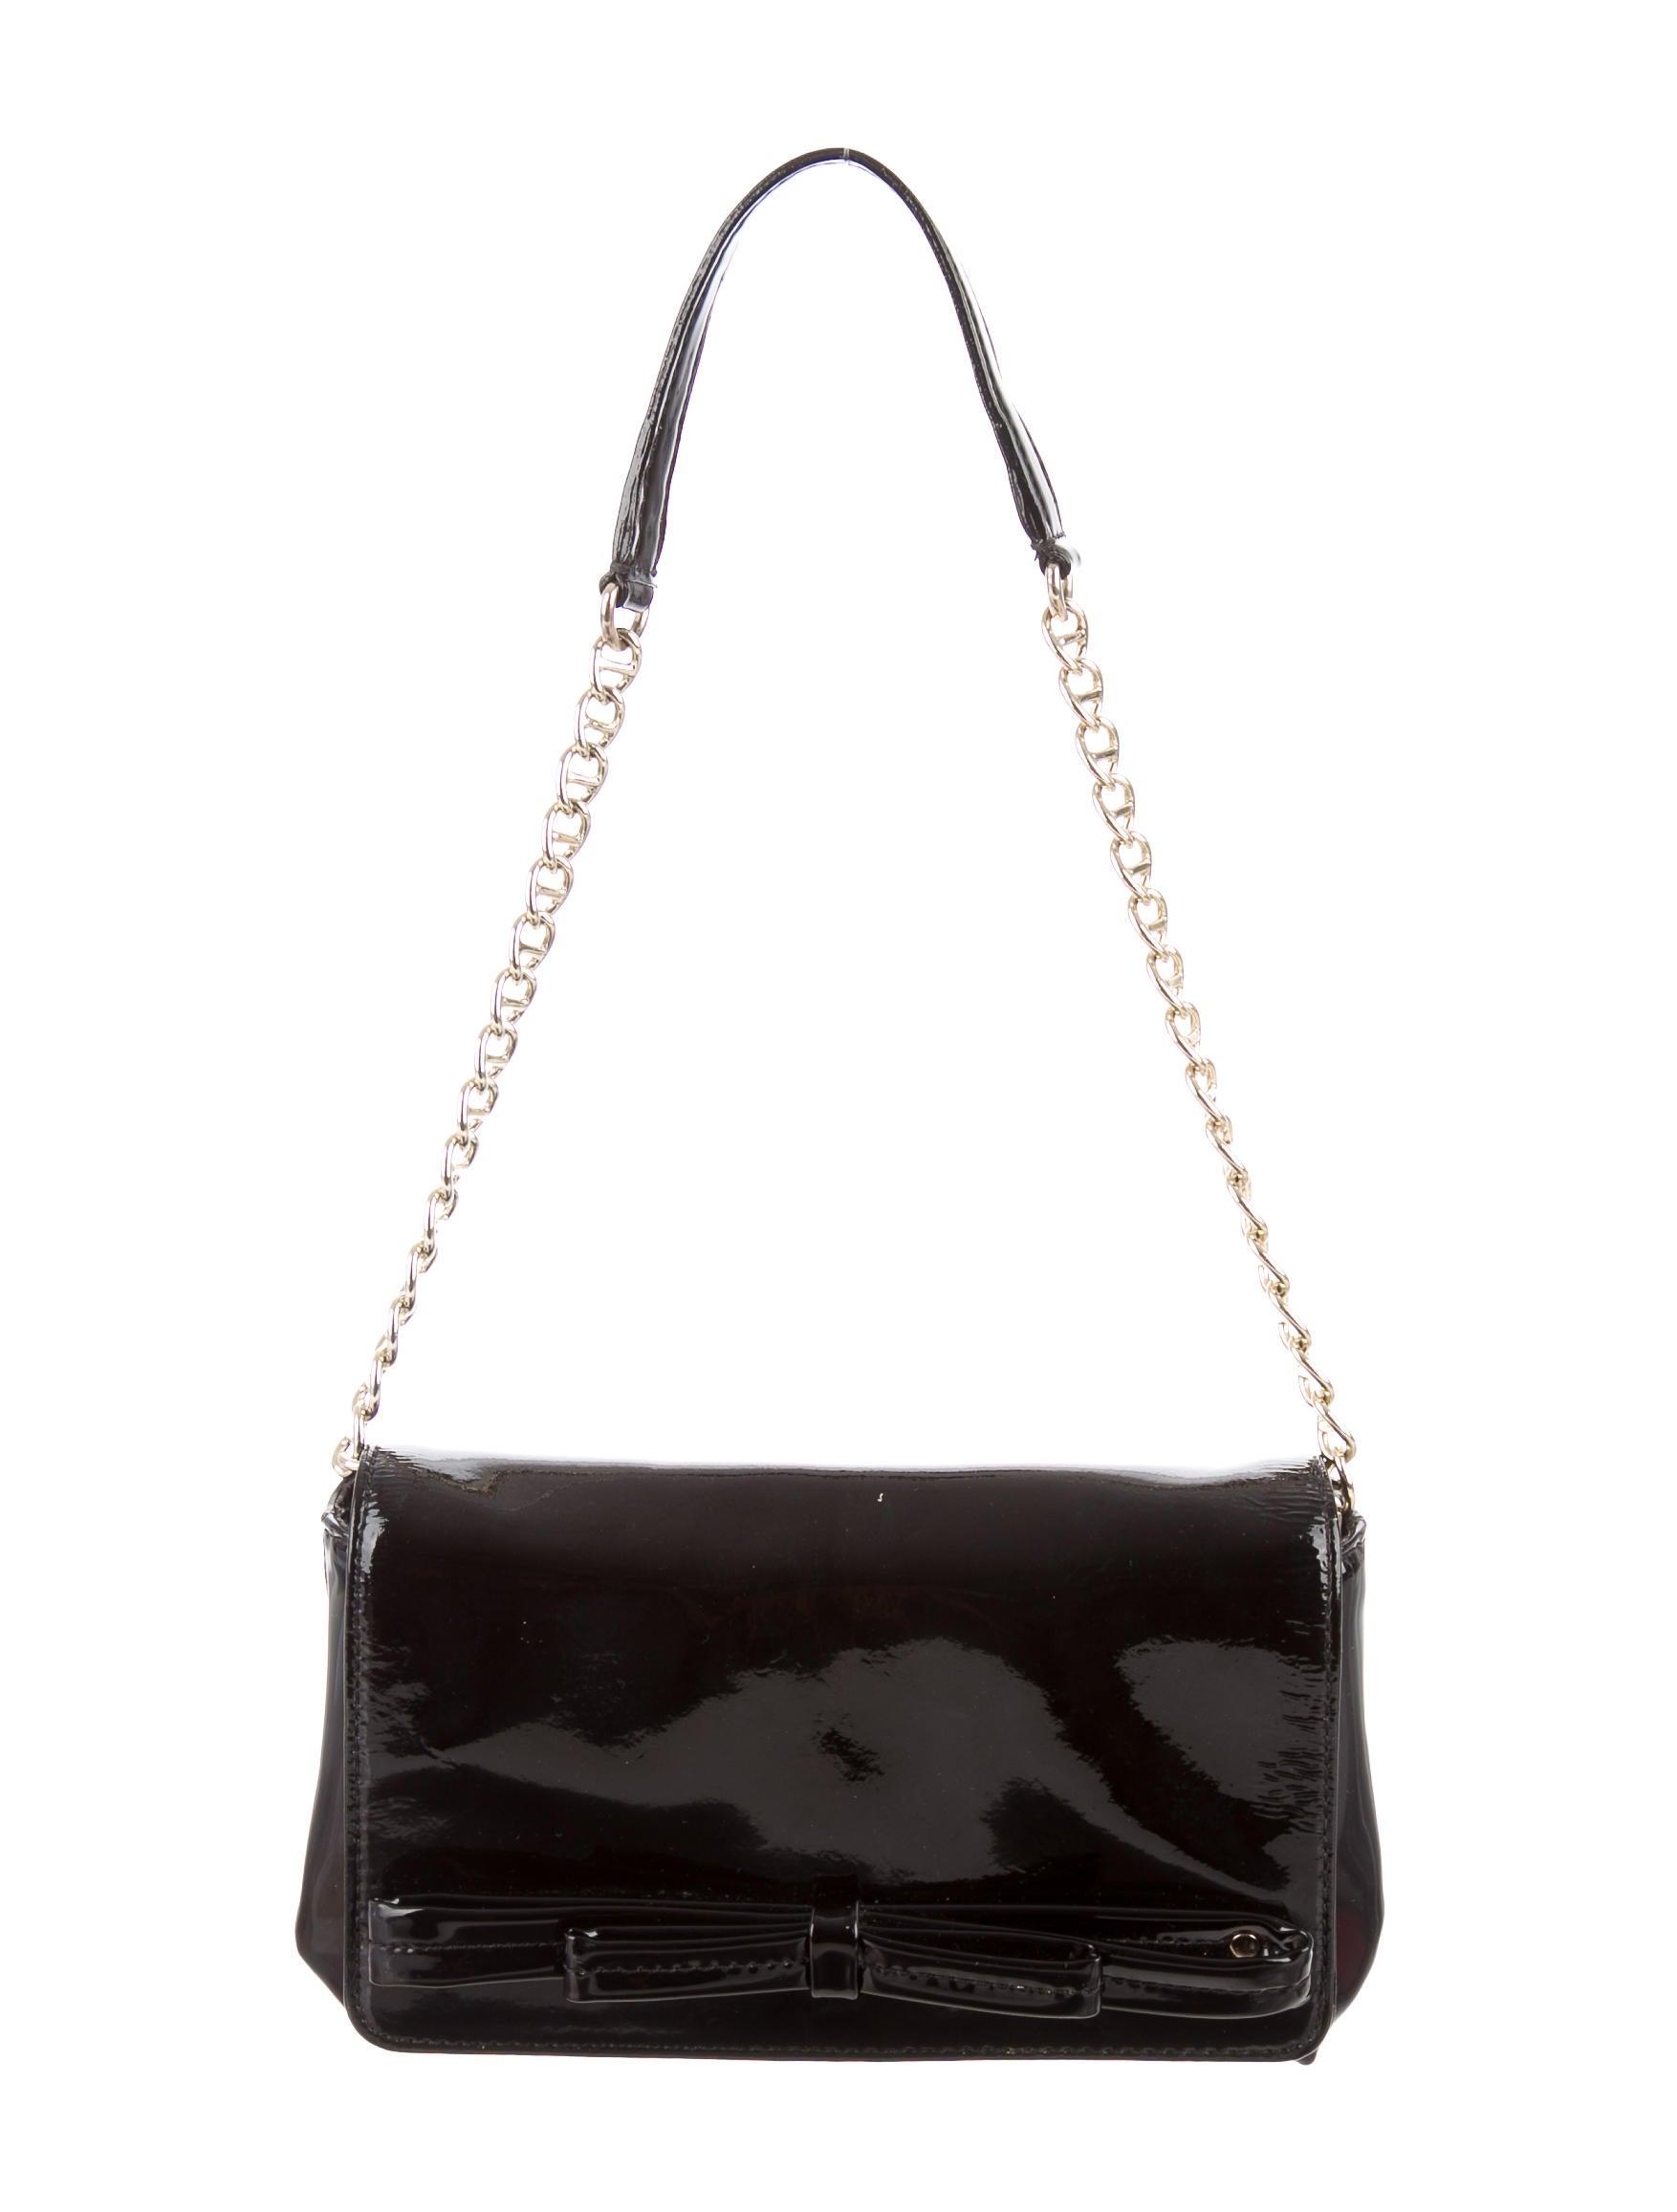 Kate Spade New York Patent Leather Shoulder Bag Handbags